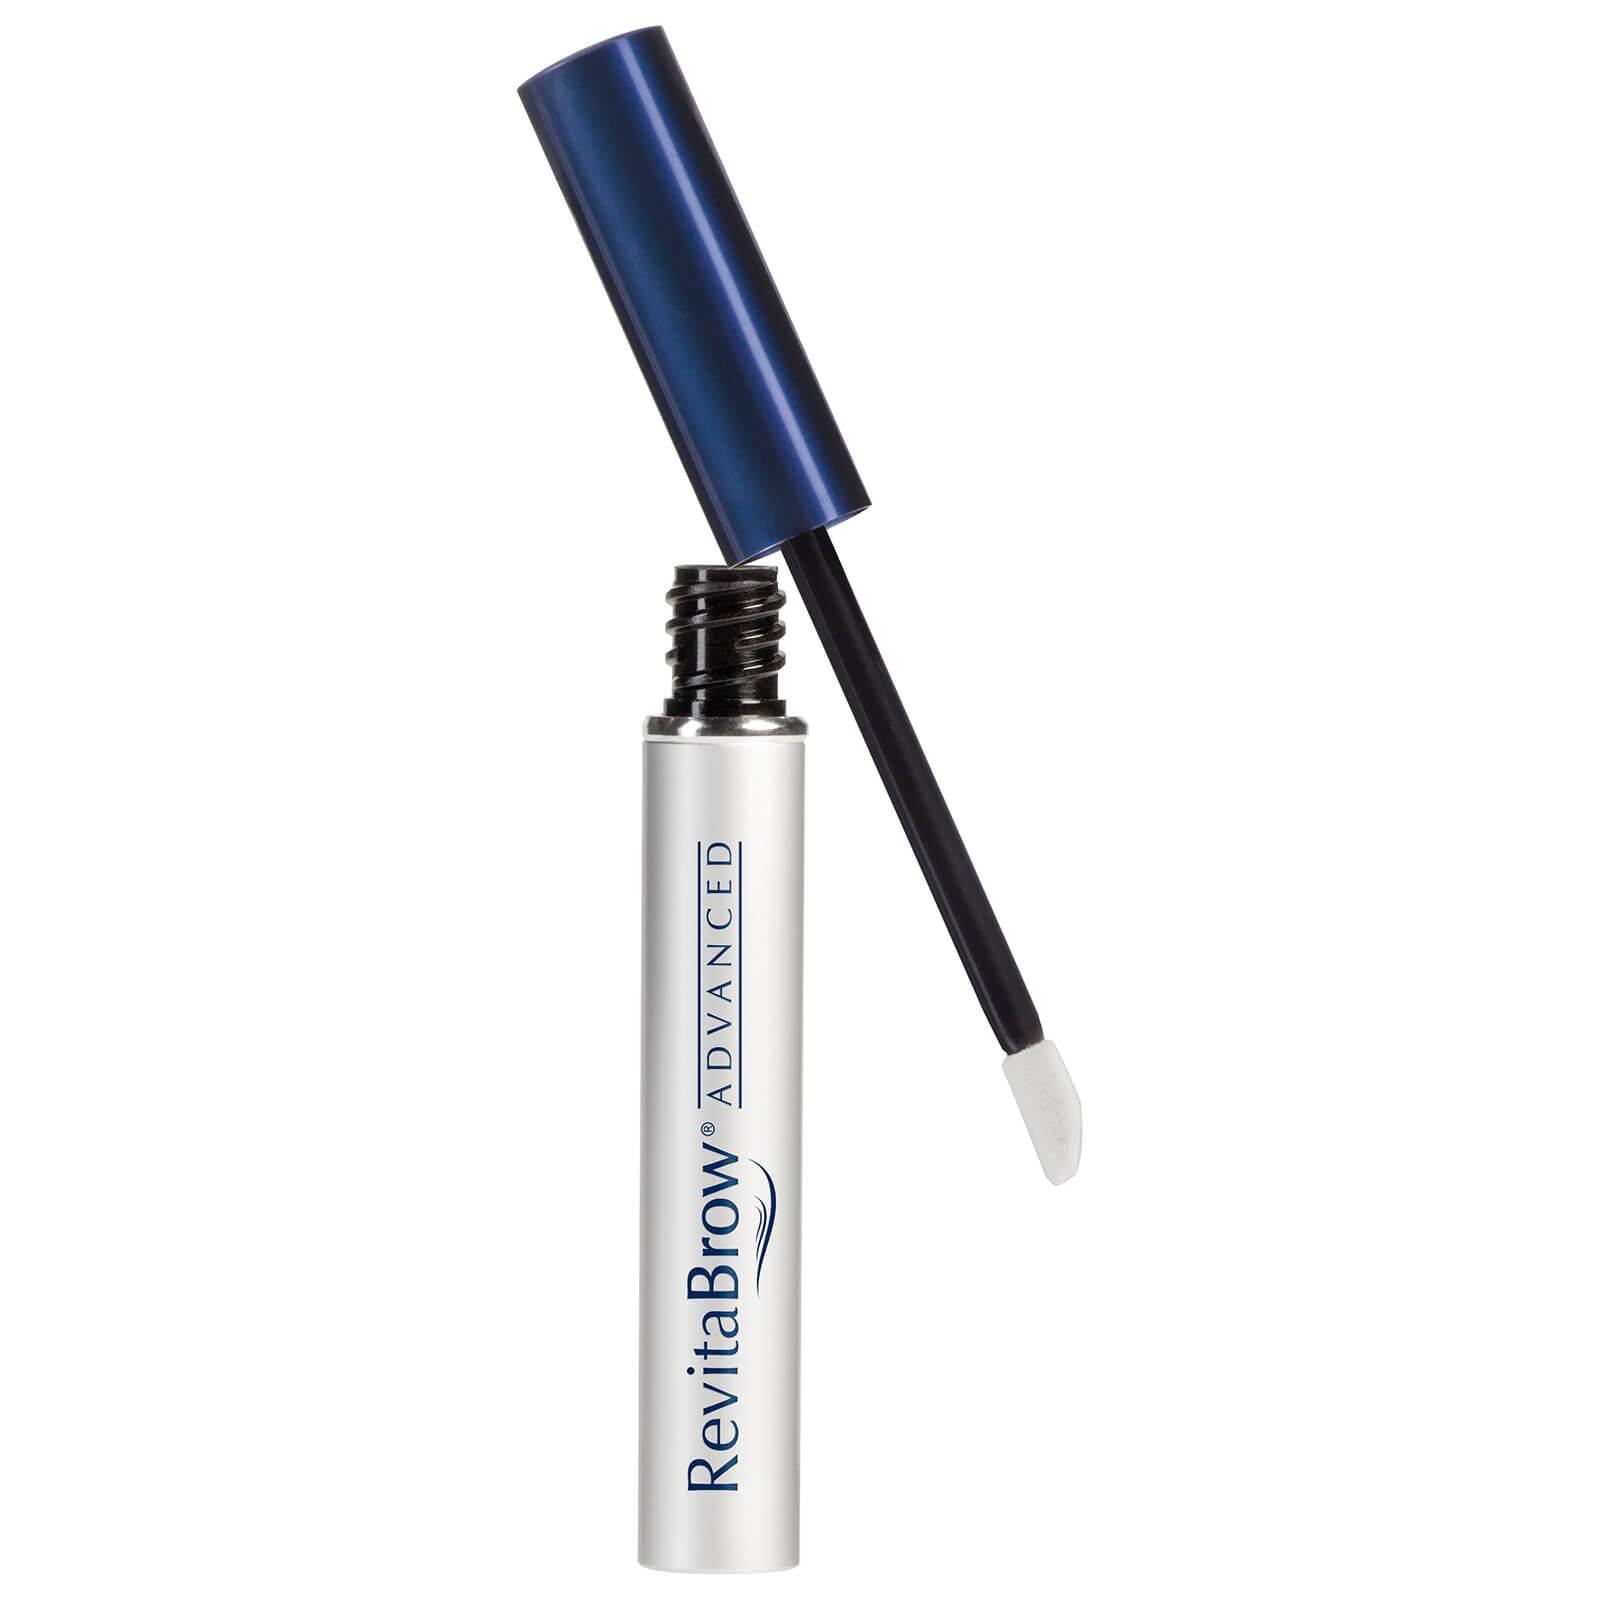 Revitabrow Eyebrow Conditioner 3ml Buy Online At Skincarerx